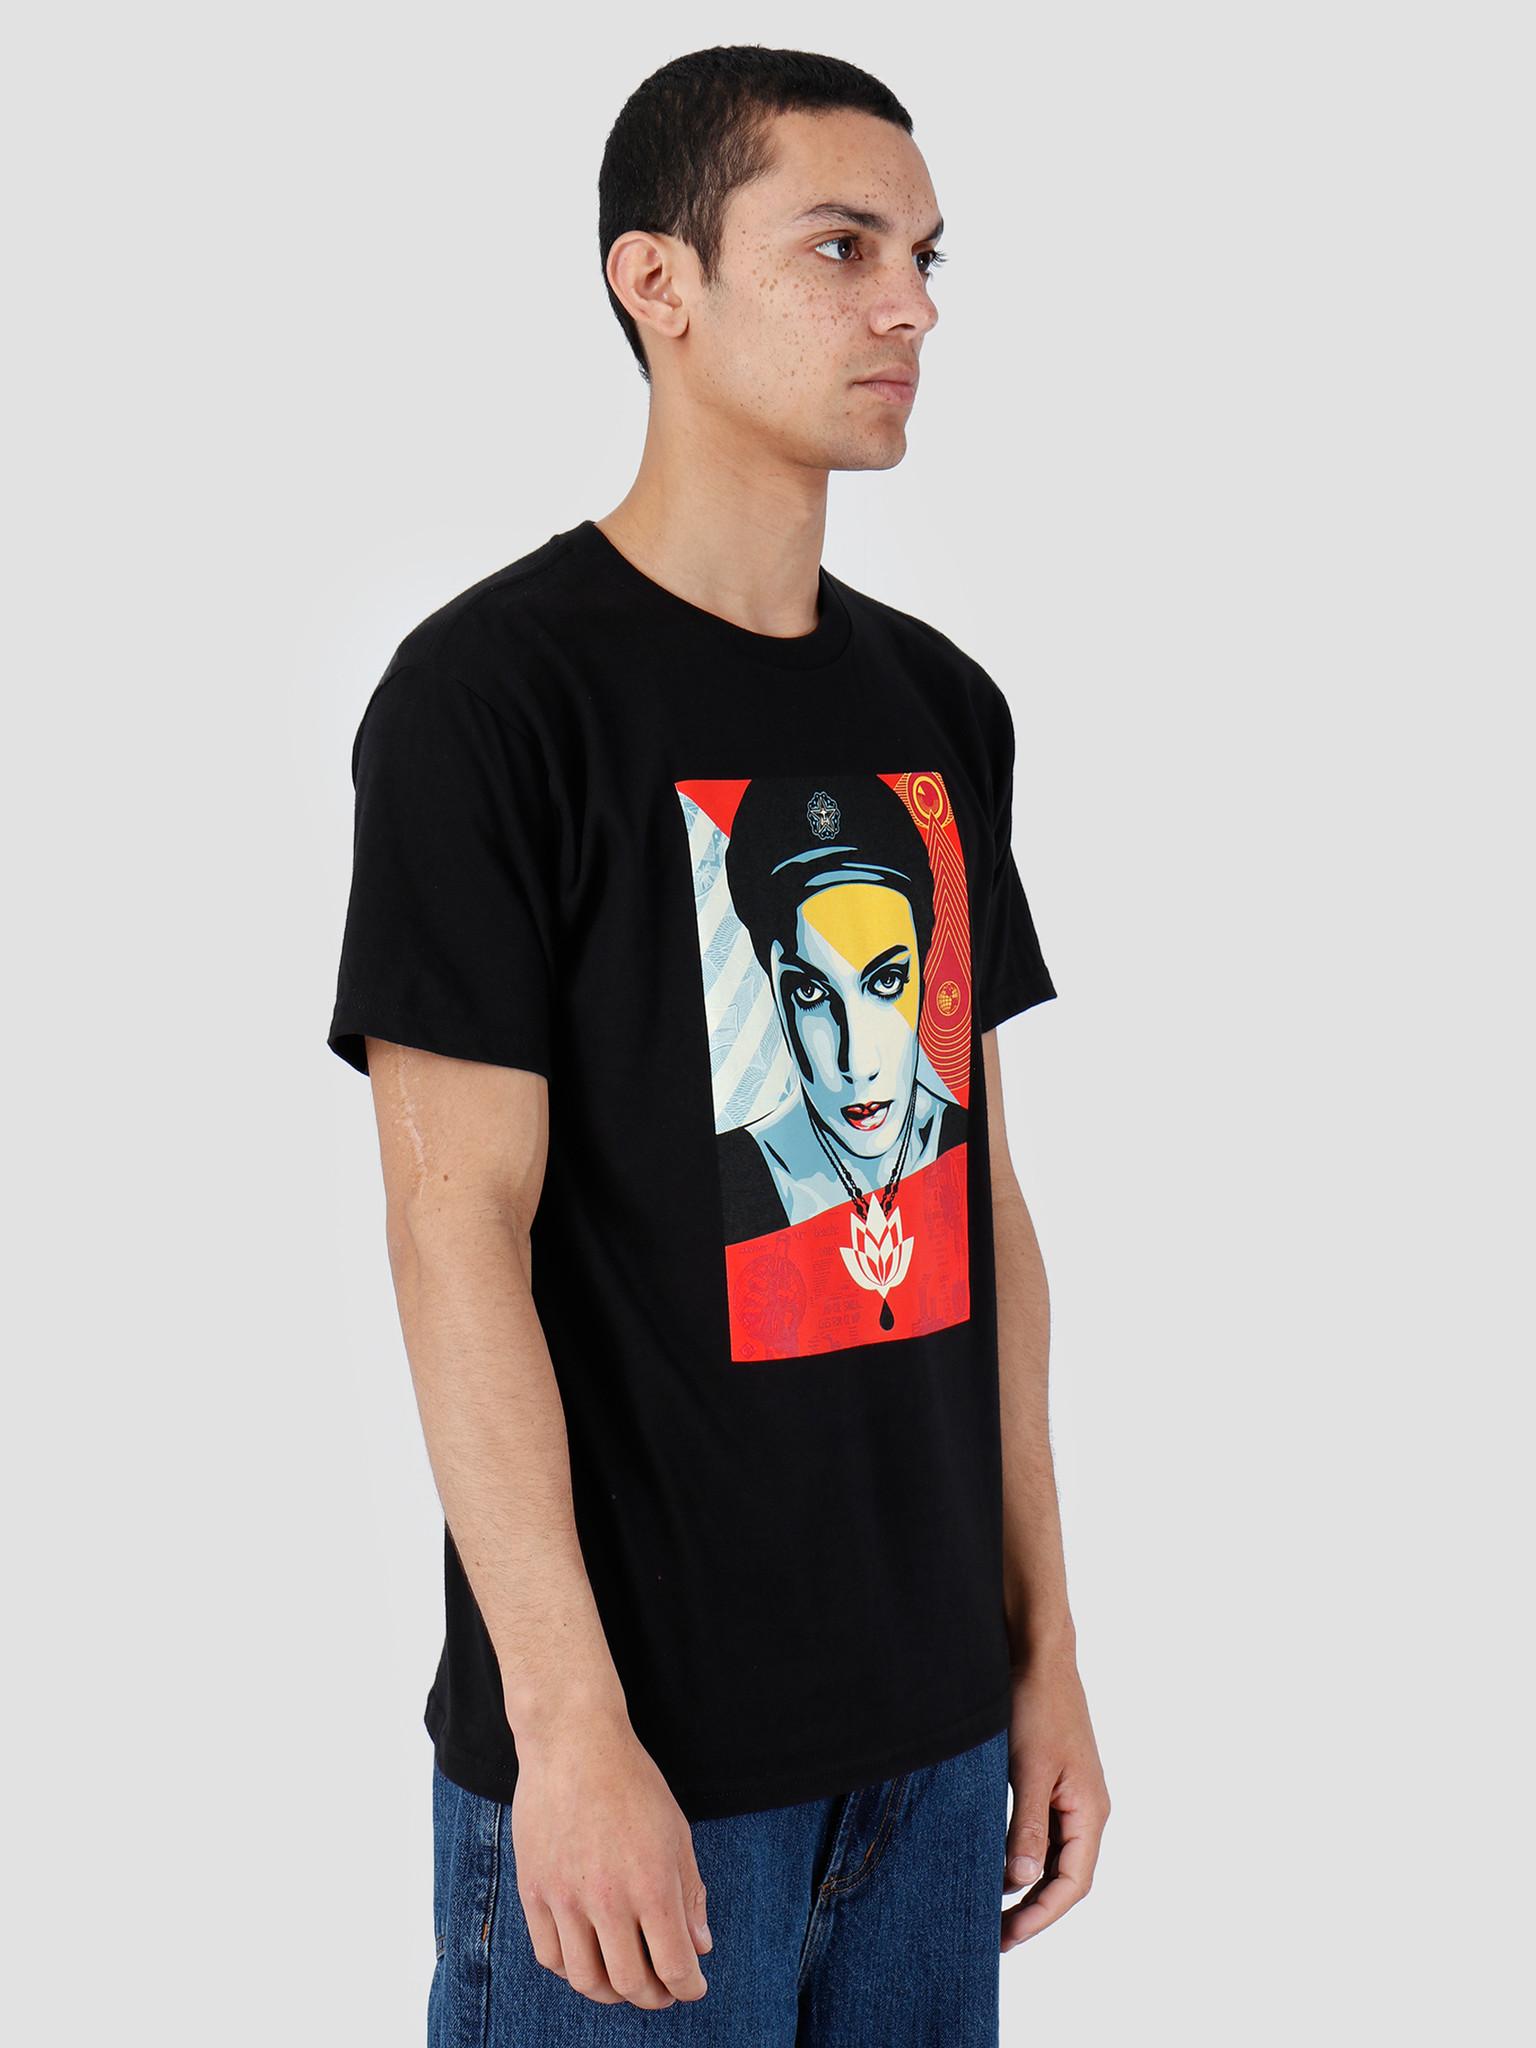 Obey Obey Basic T-Shirt Black 163082007-BLK